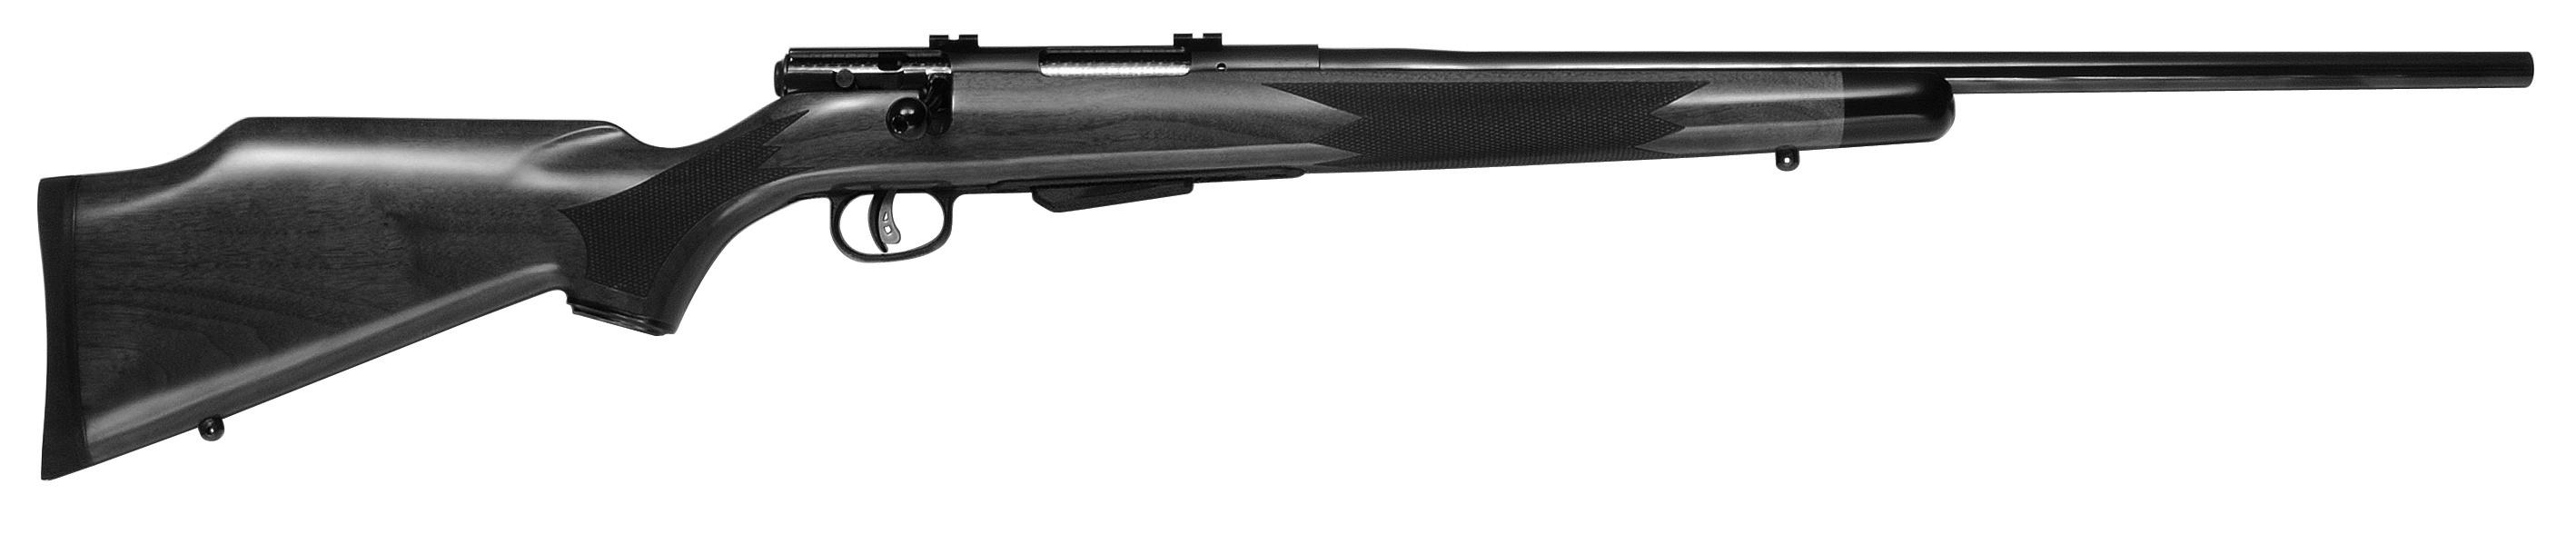 Model 25 Classic Sporter